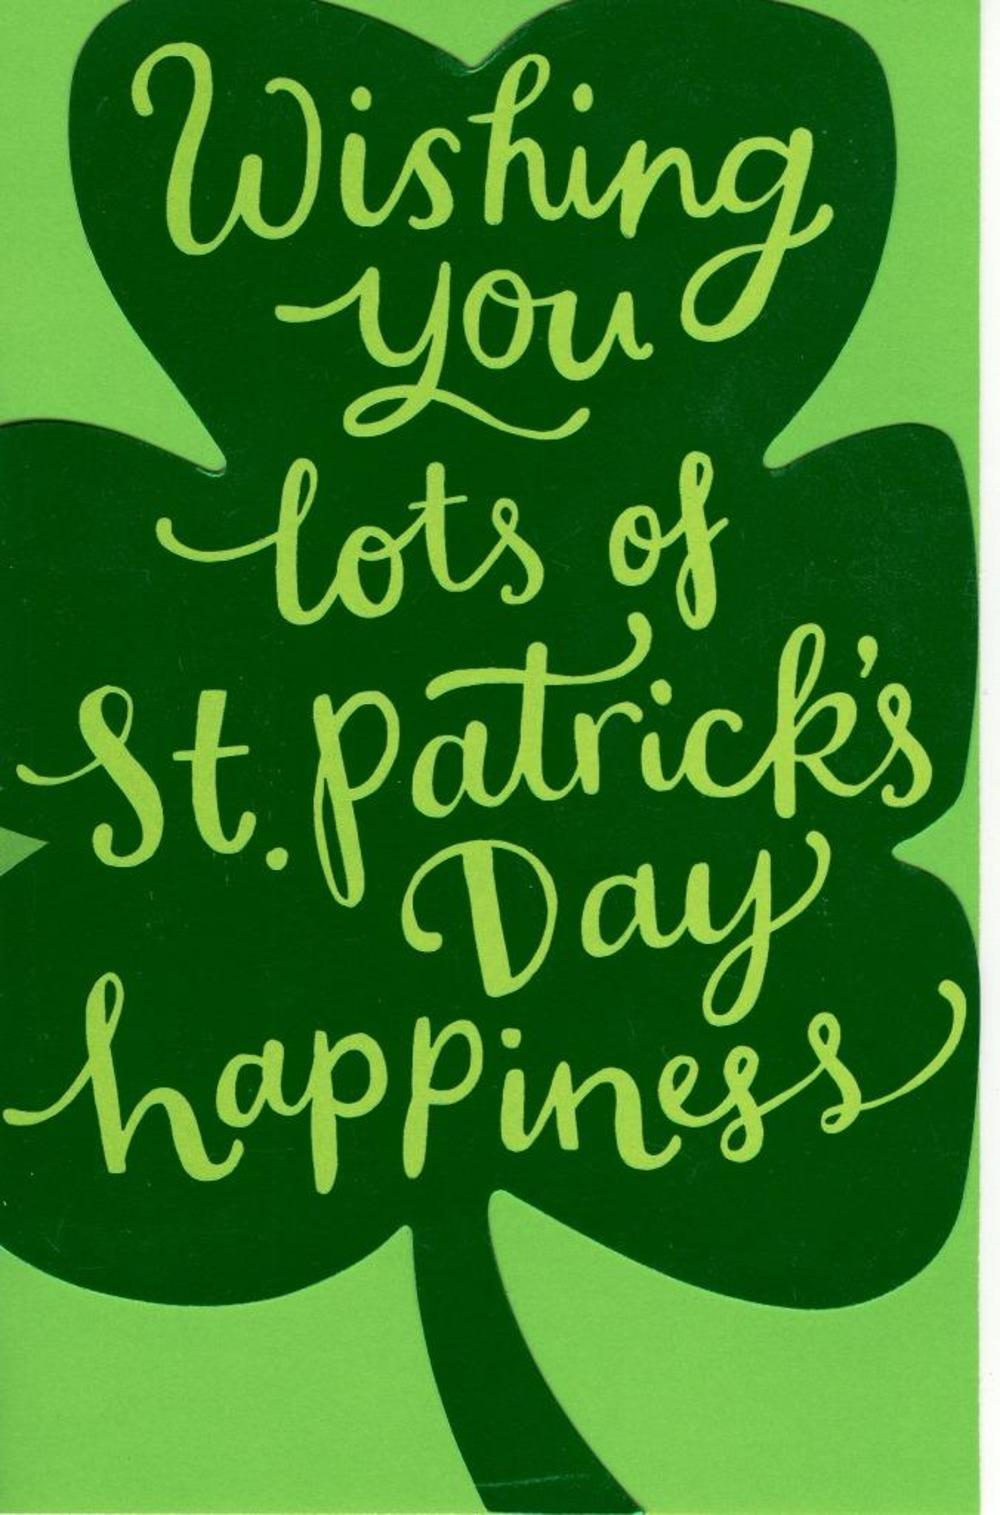 St Patrick's Day Shamrock Greeting Card